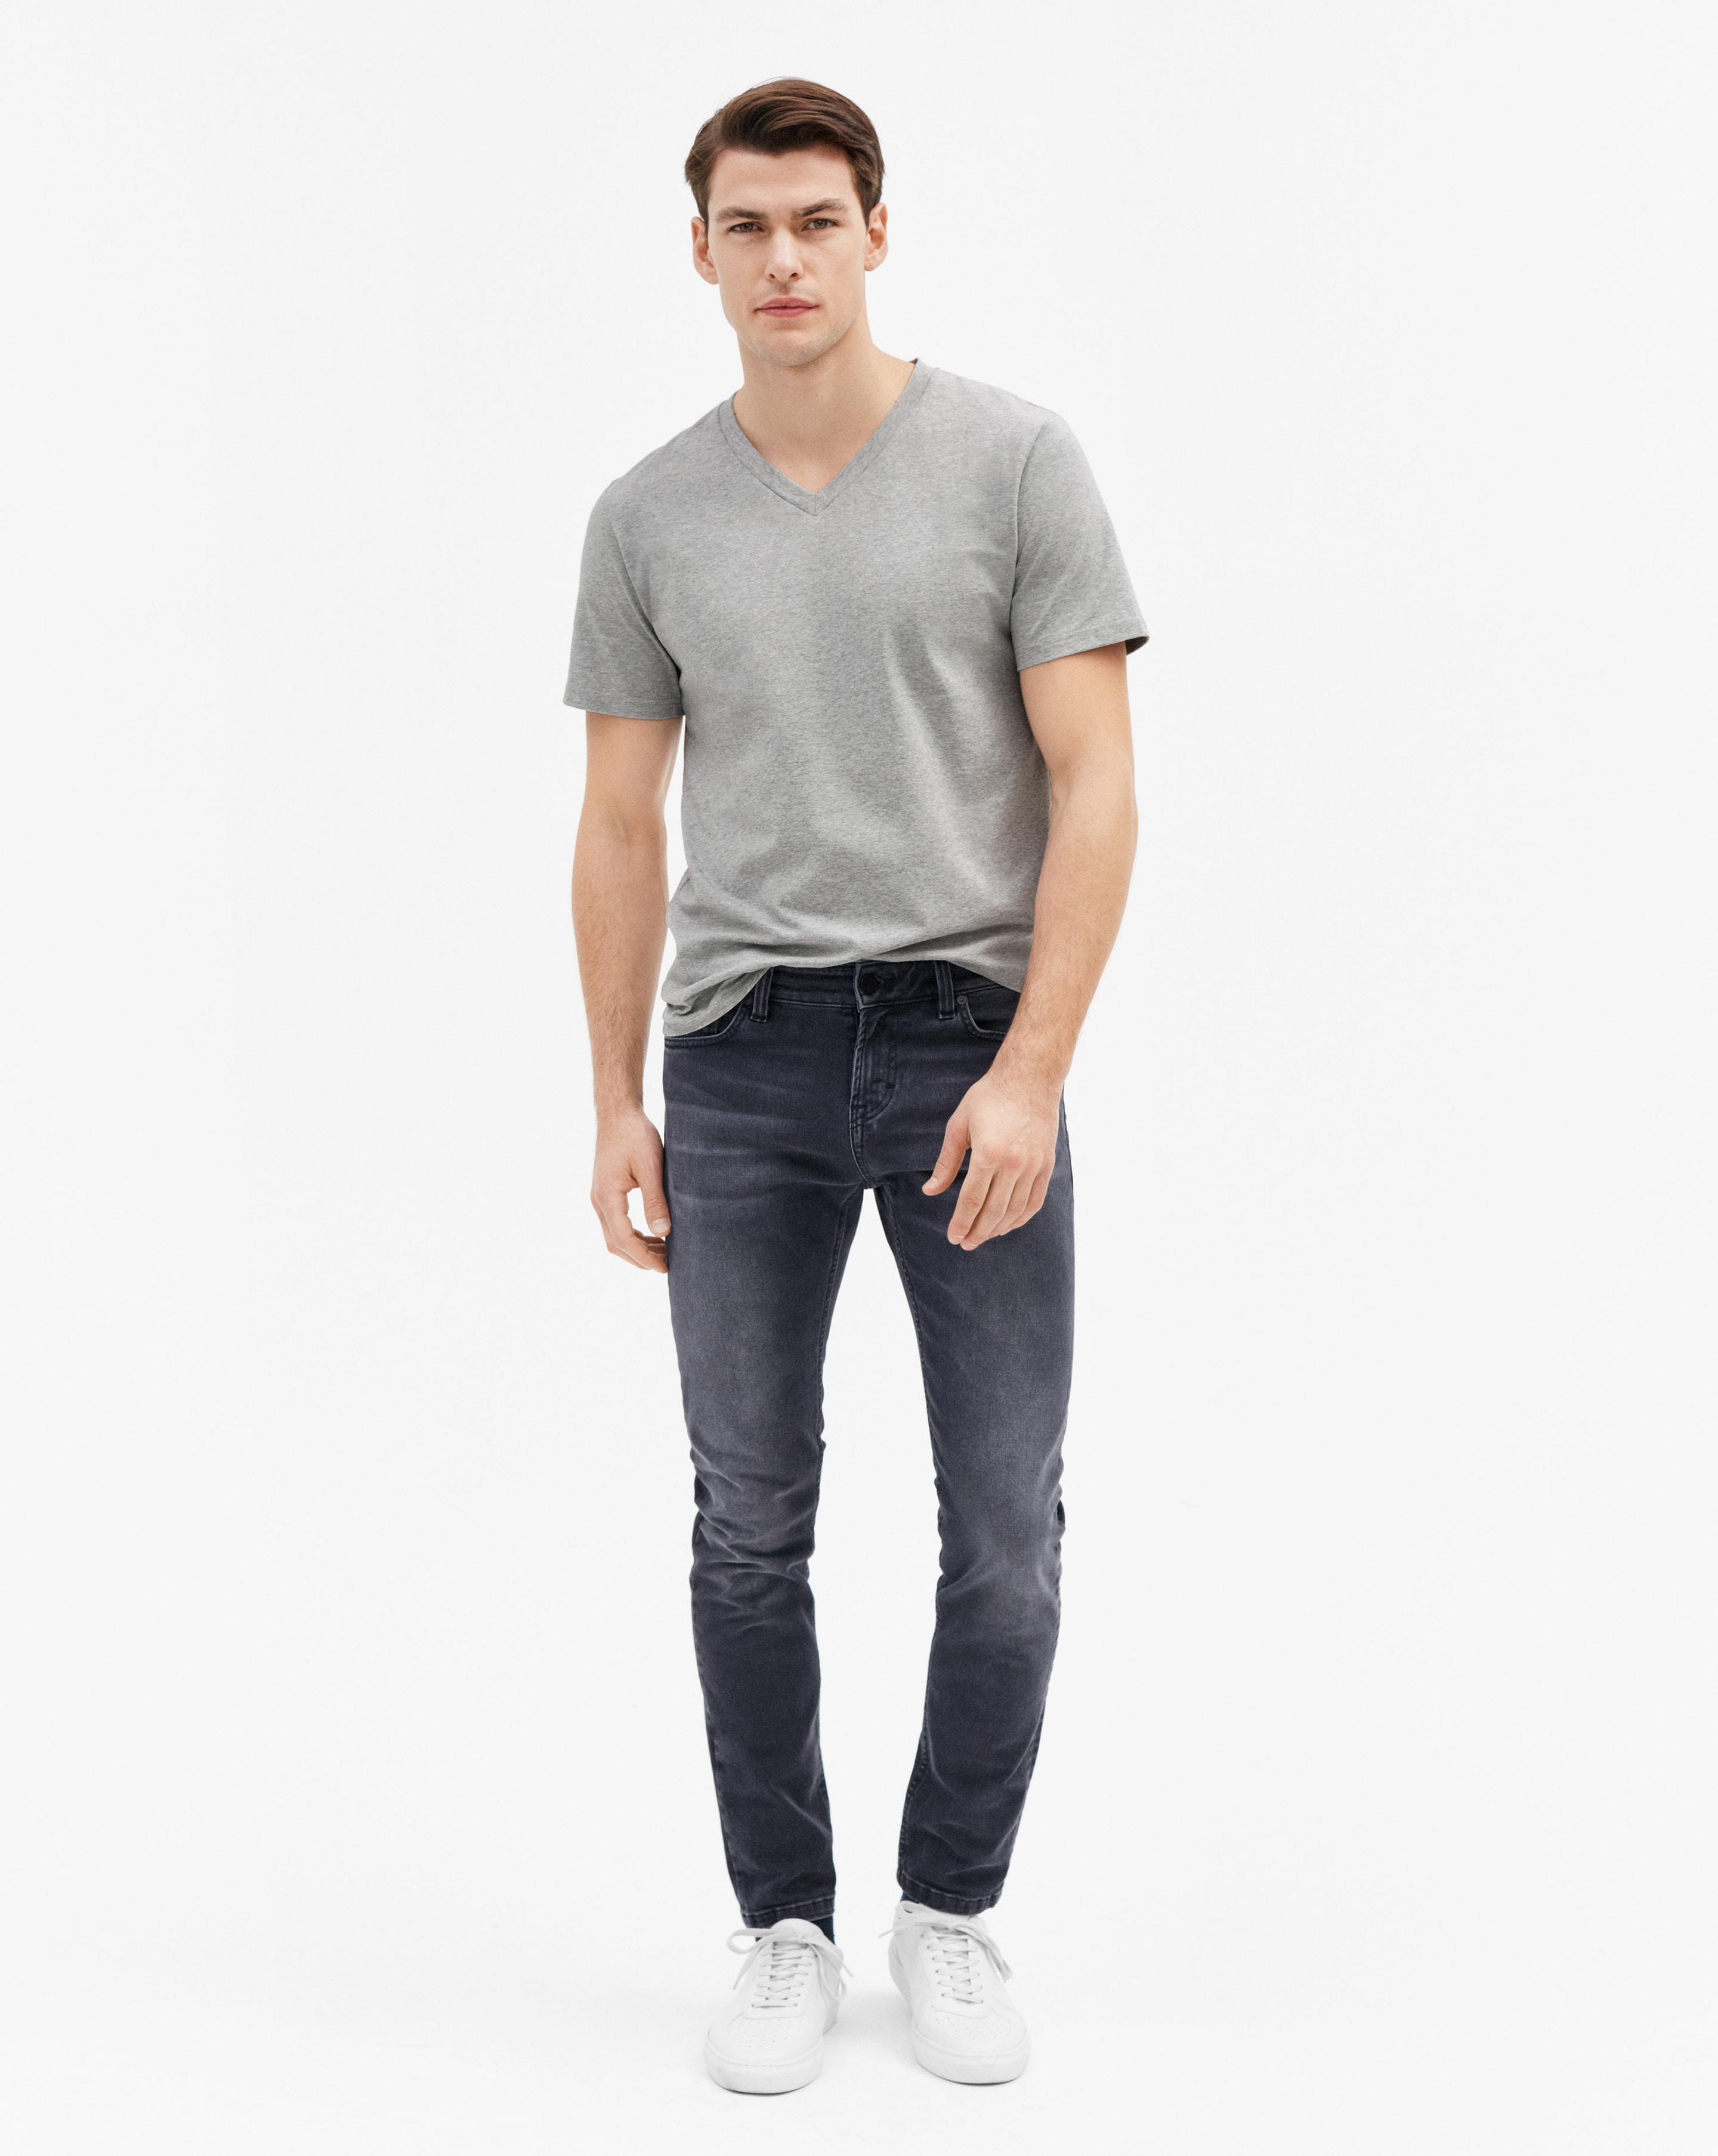 lenkkitossut jaloissa Viimeisin Filippa K Denim Rob Grey Wash Jeans in Gray for Men - Lyst